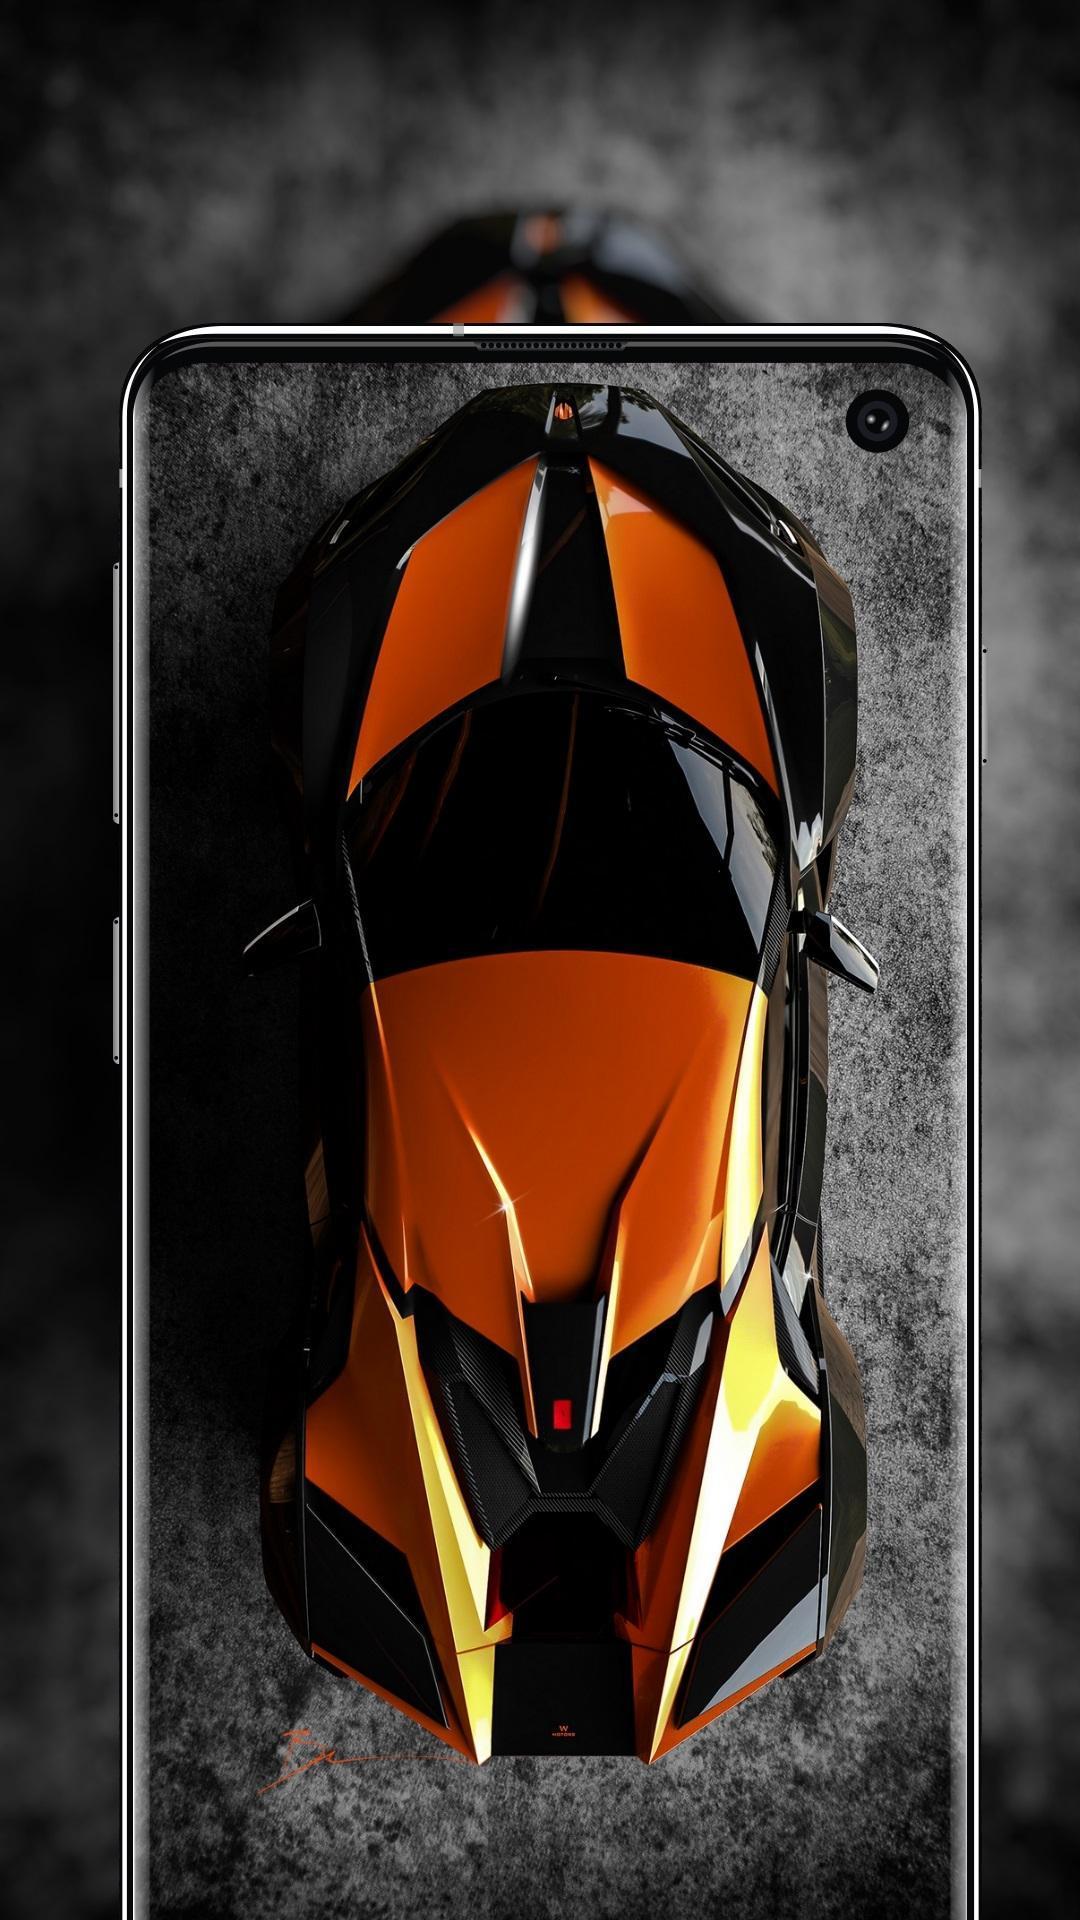 Android용 Sport Car Wallpaper - Super Amoled 4k and Full HD ...